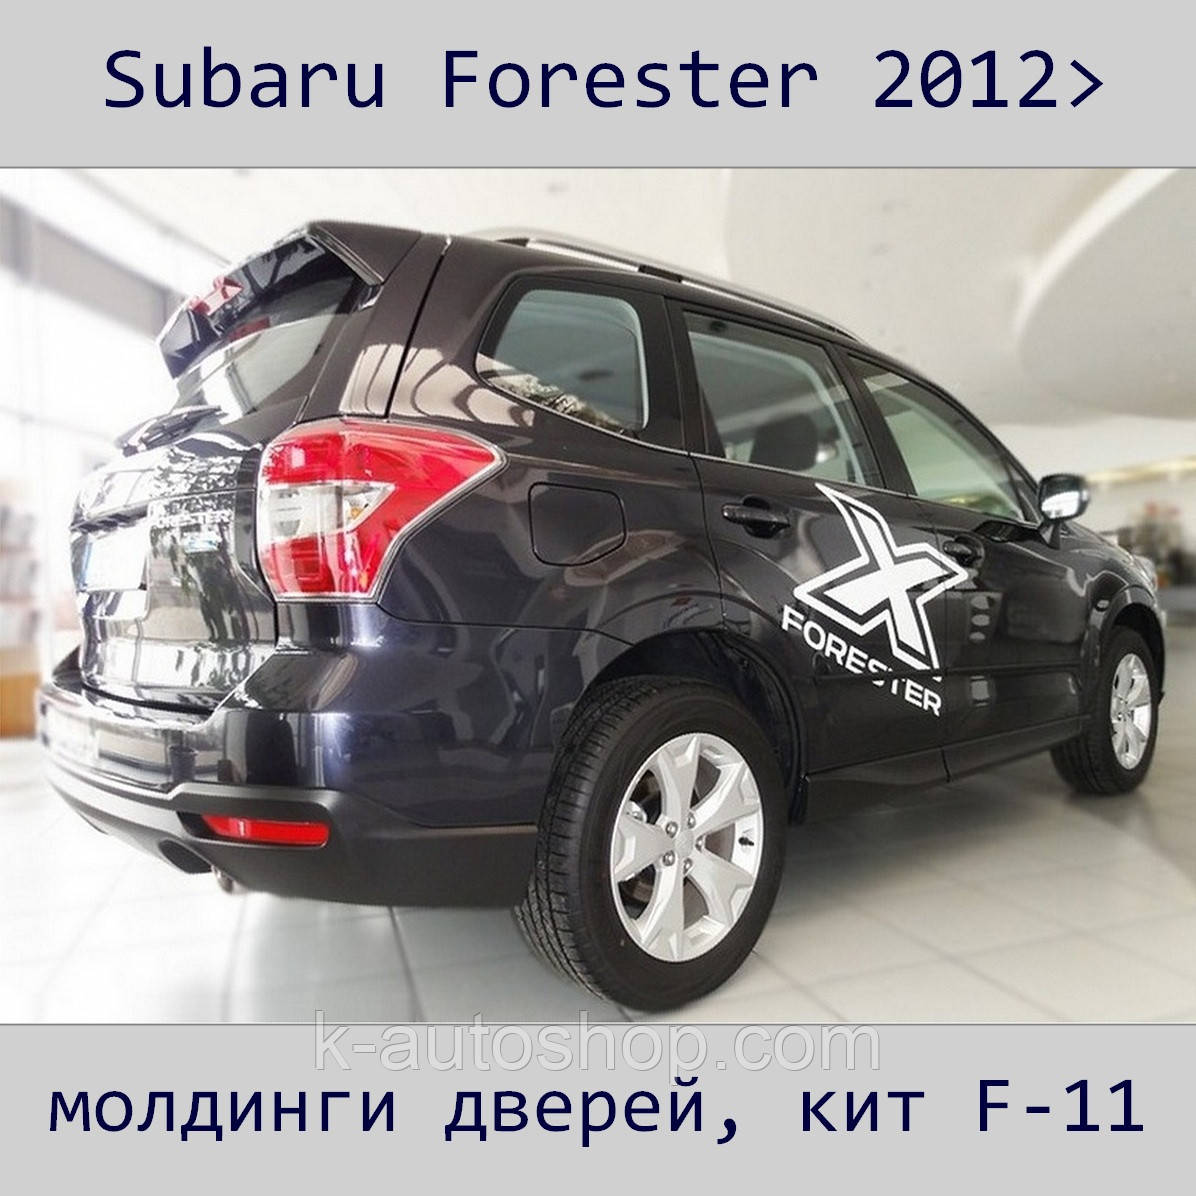 Молдинги на двери Subaru Forester 2012>